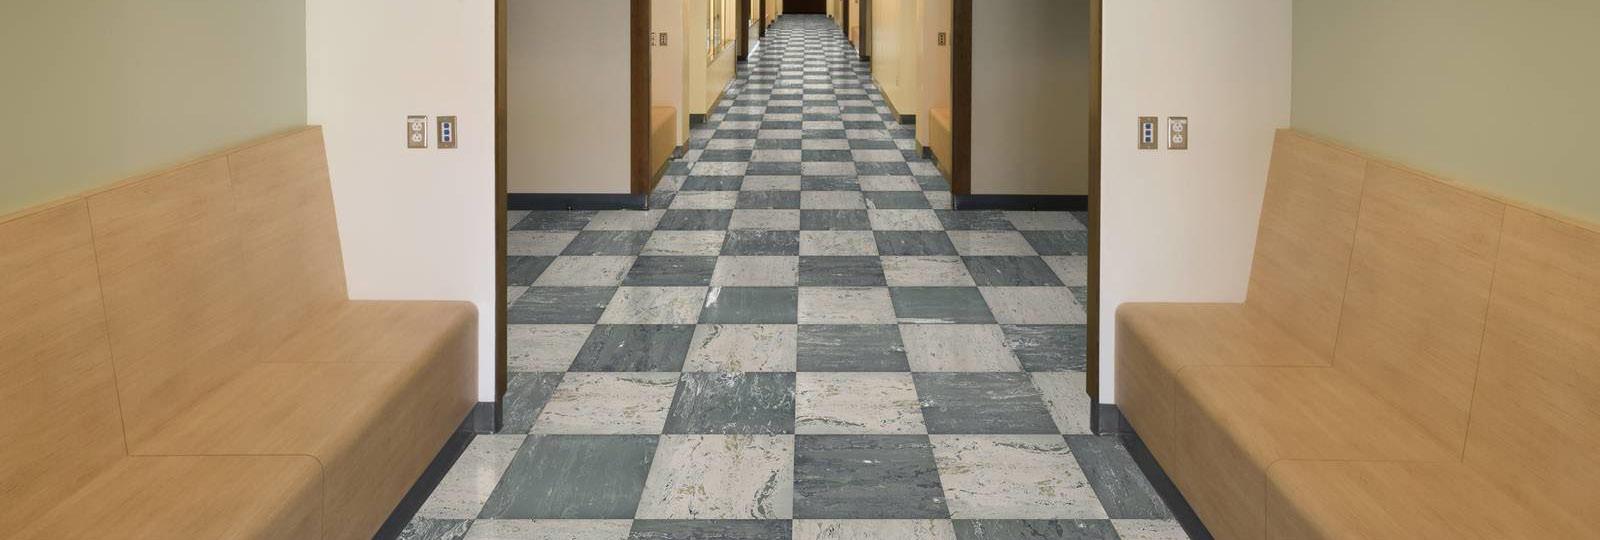 Burke Flooring